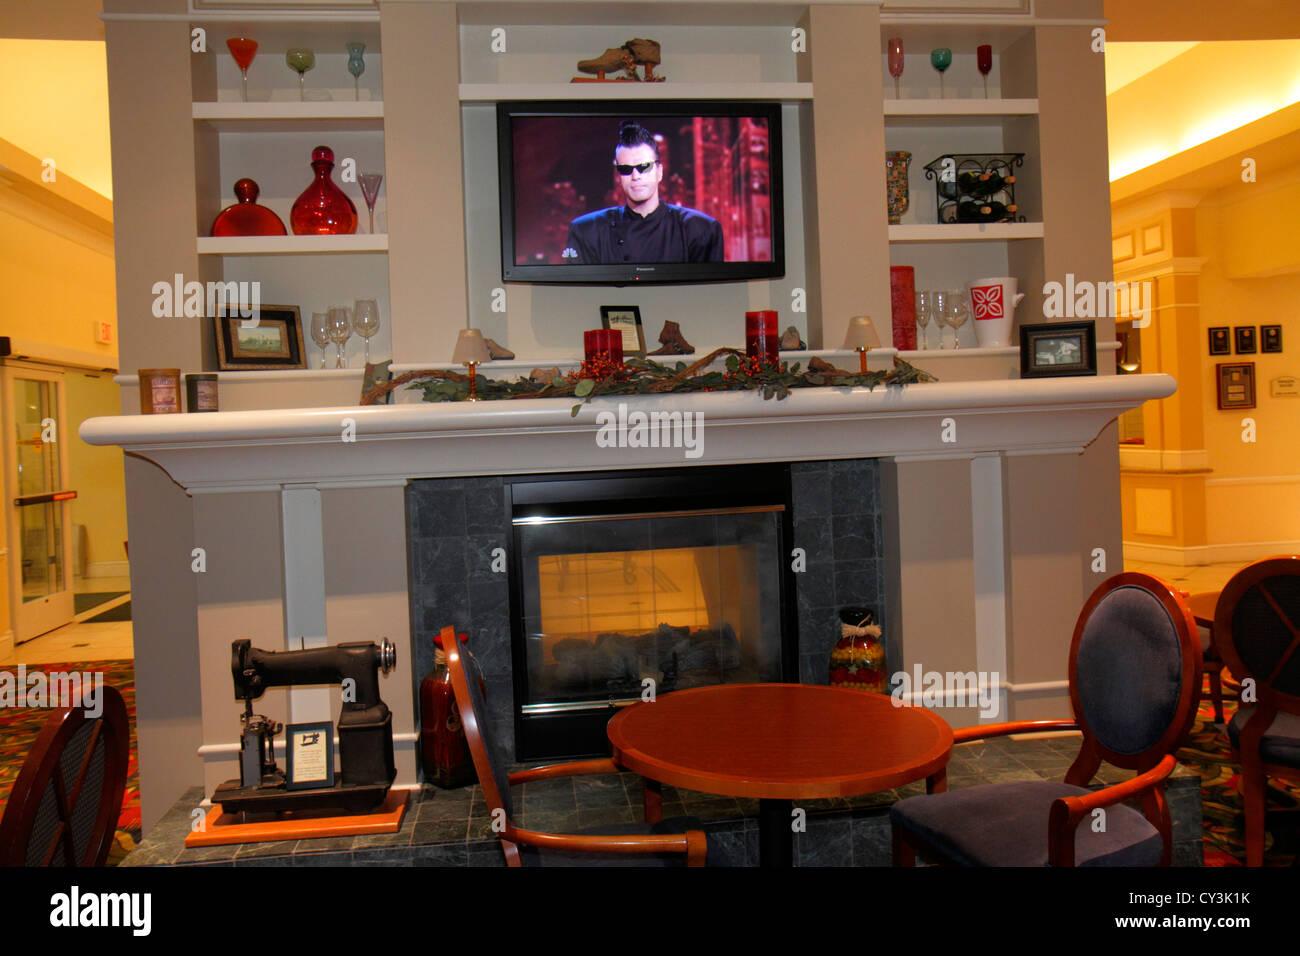 maine freeport hilton garden inn motel hotel lobby fireplace decor